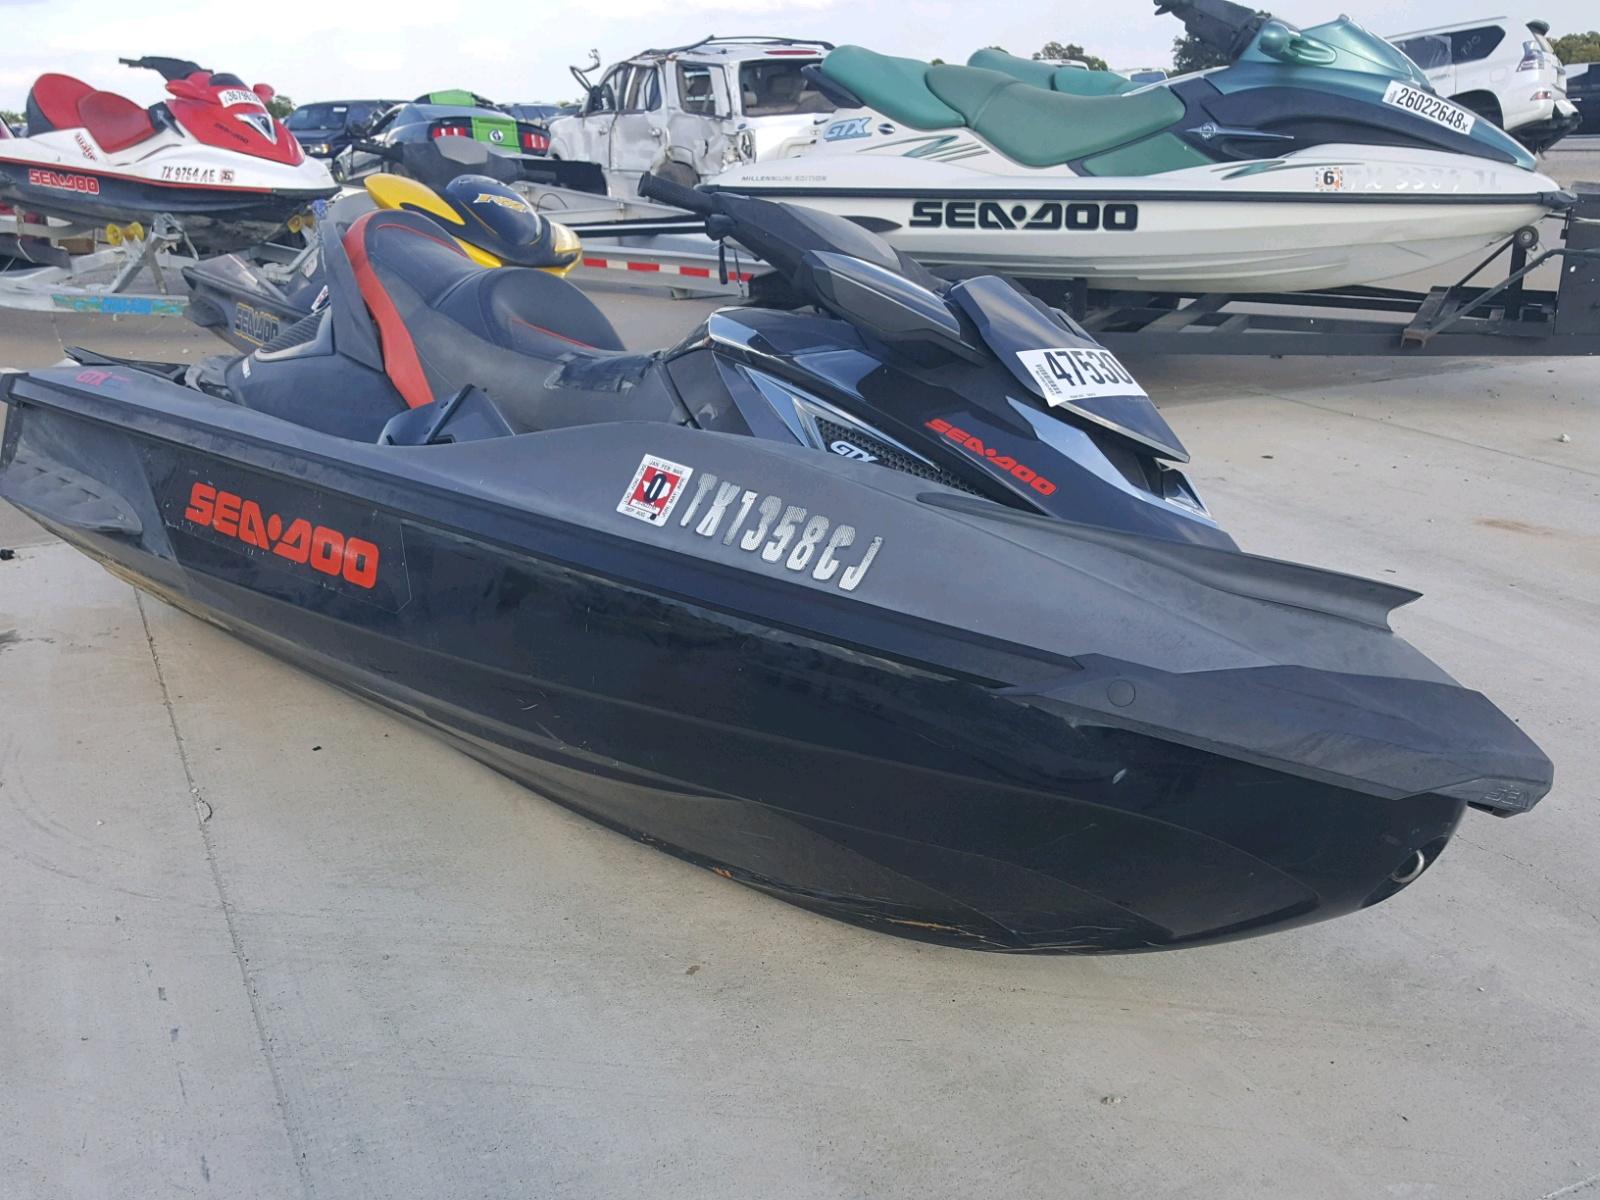 Salvage 2013 Seadoo GTX for sale